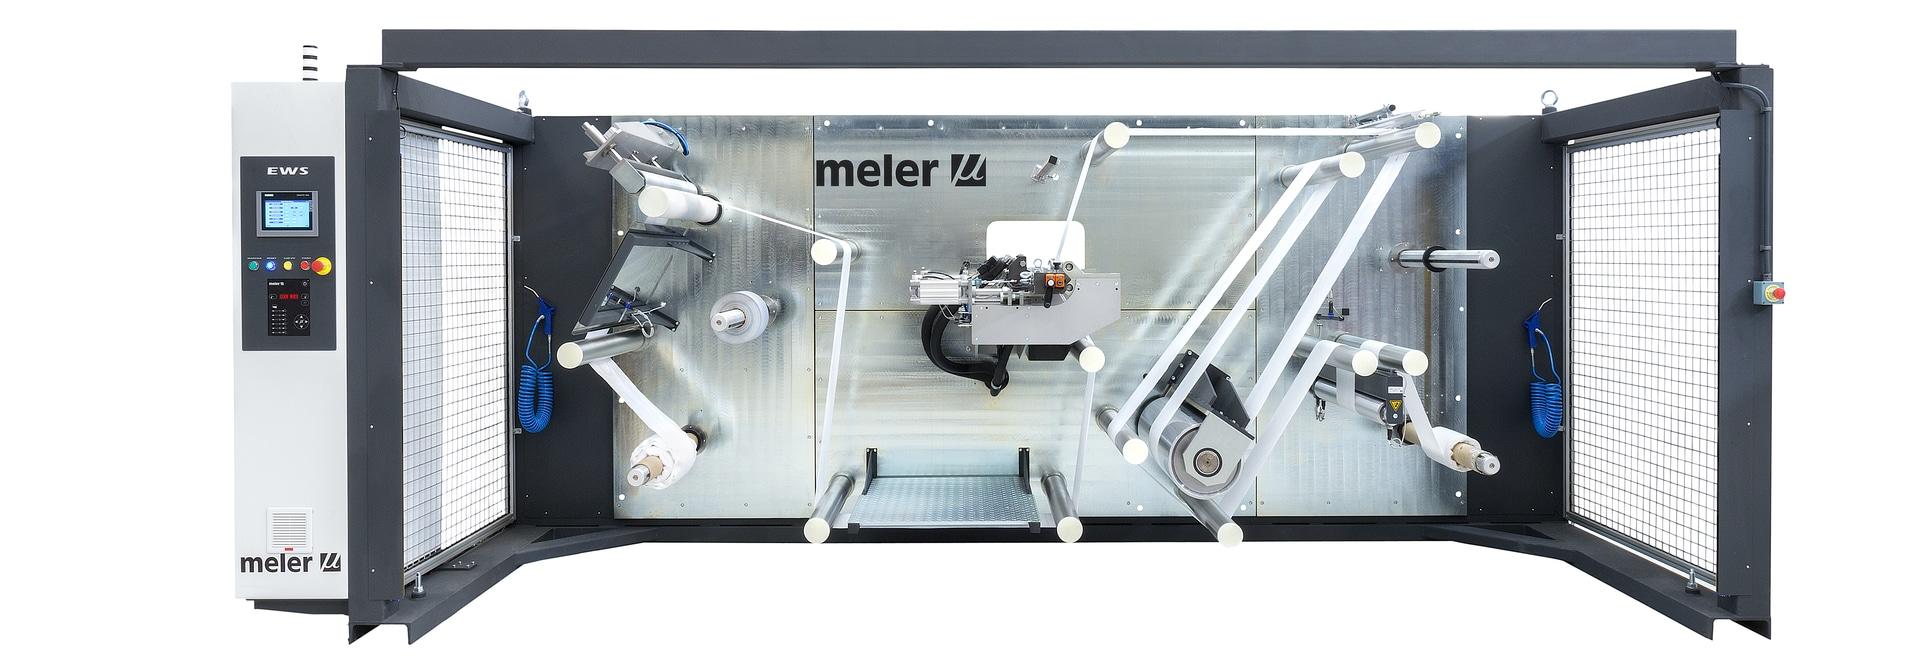 EWS winding-unwinding machine for applying Hotmelt and PUR adhesives